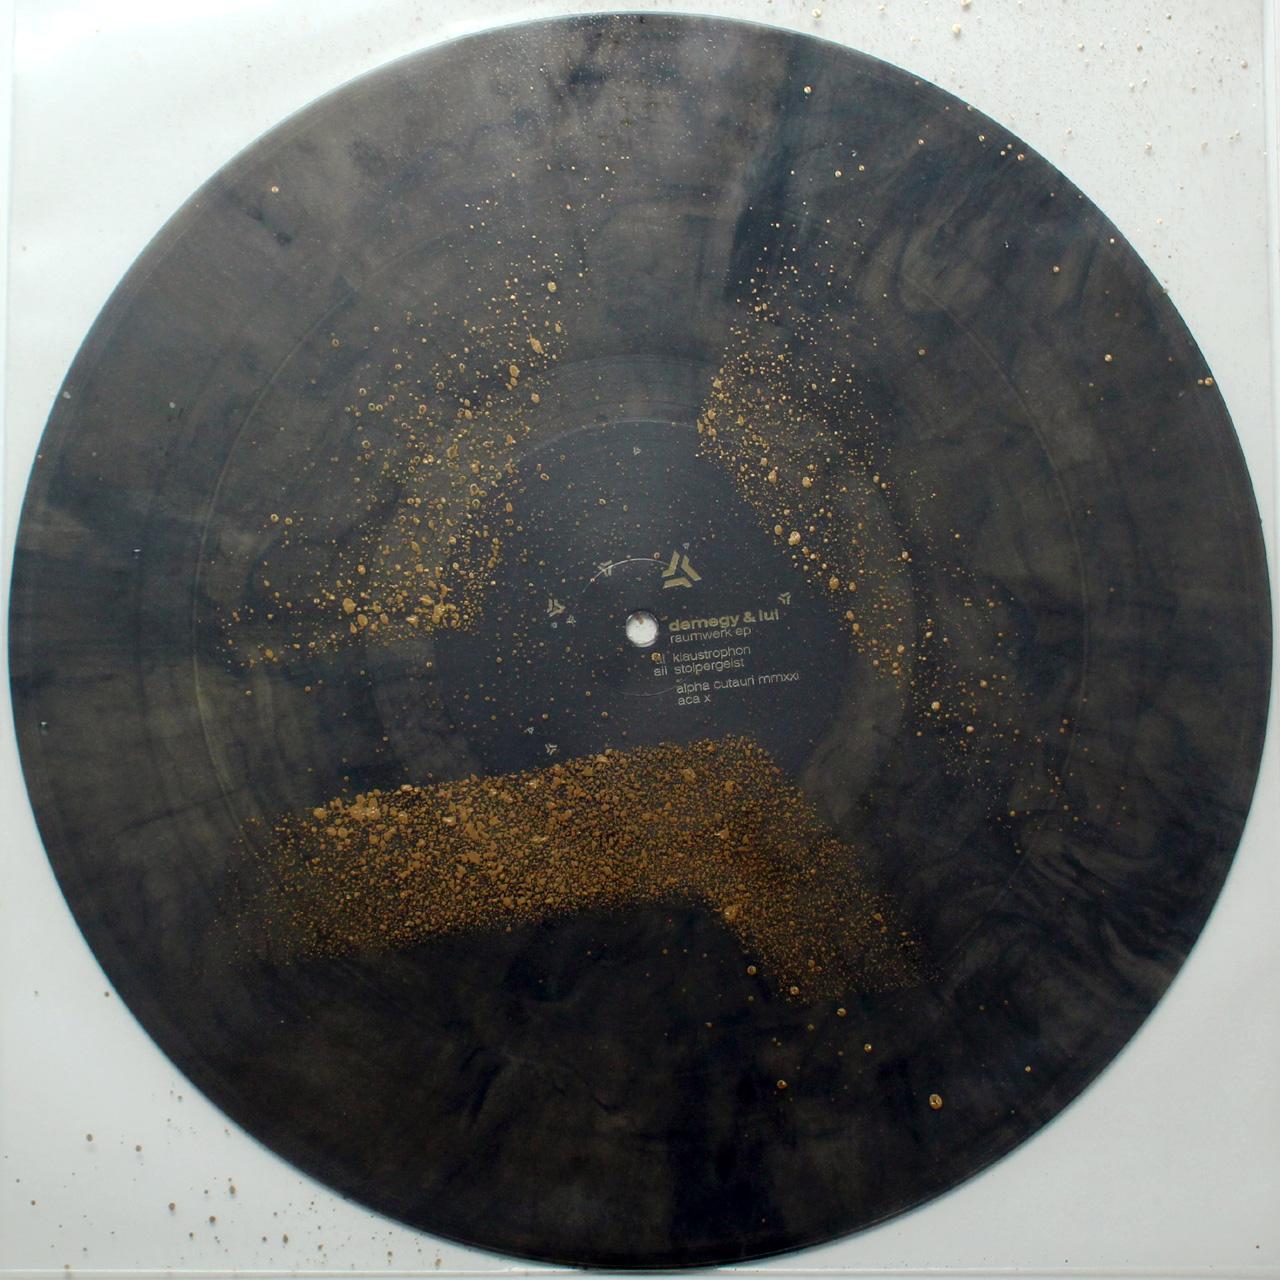 Demegy / LUI - Raumwerk EP